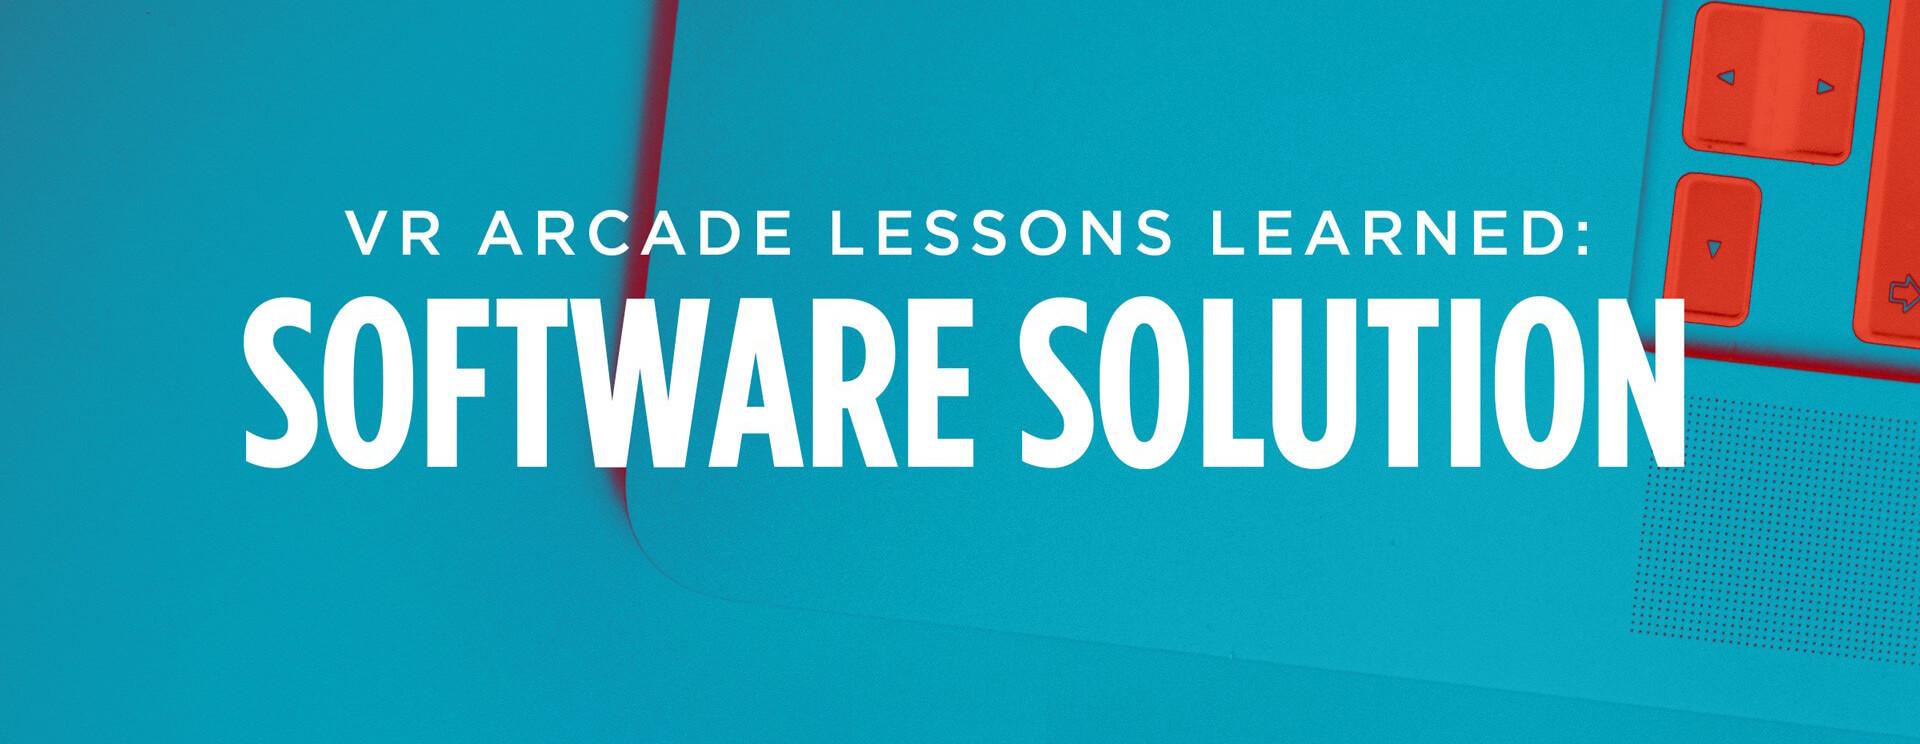 Software Solution Design: An Overview